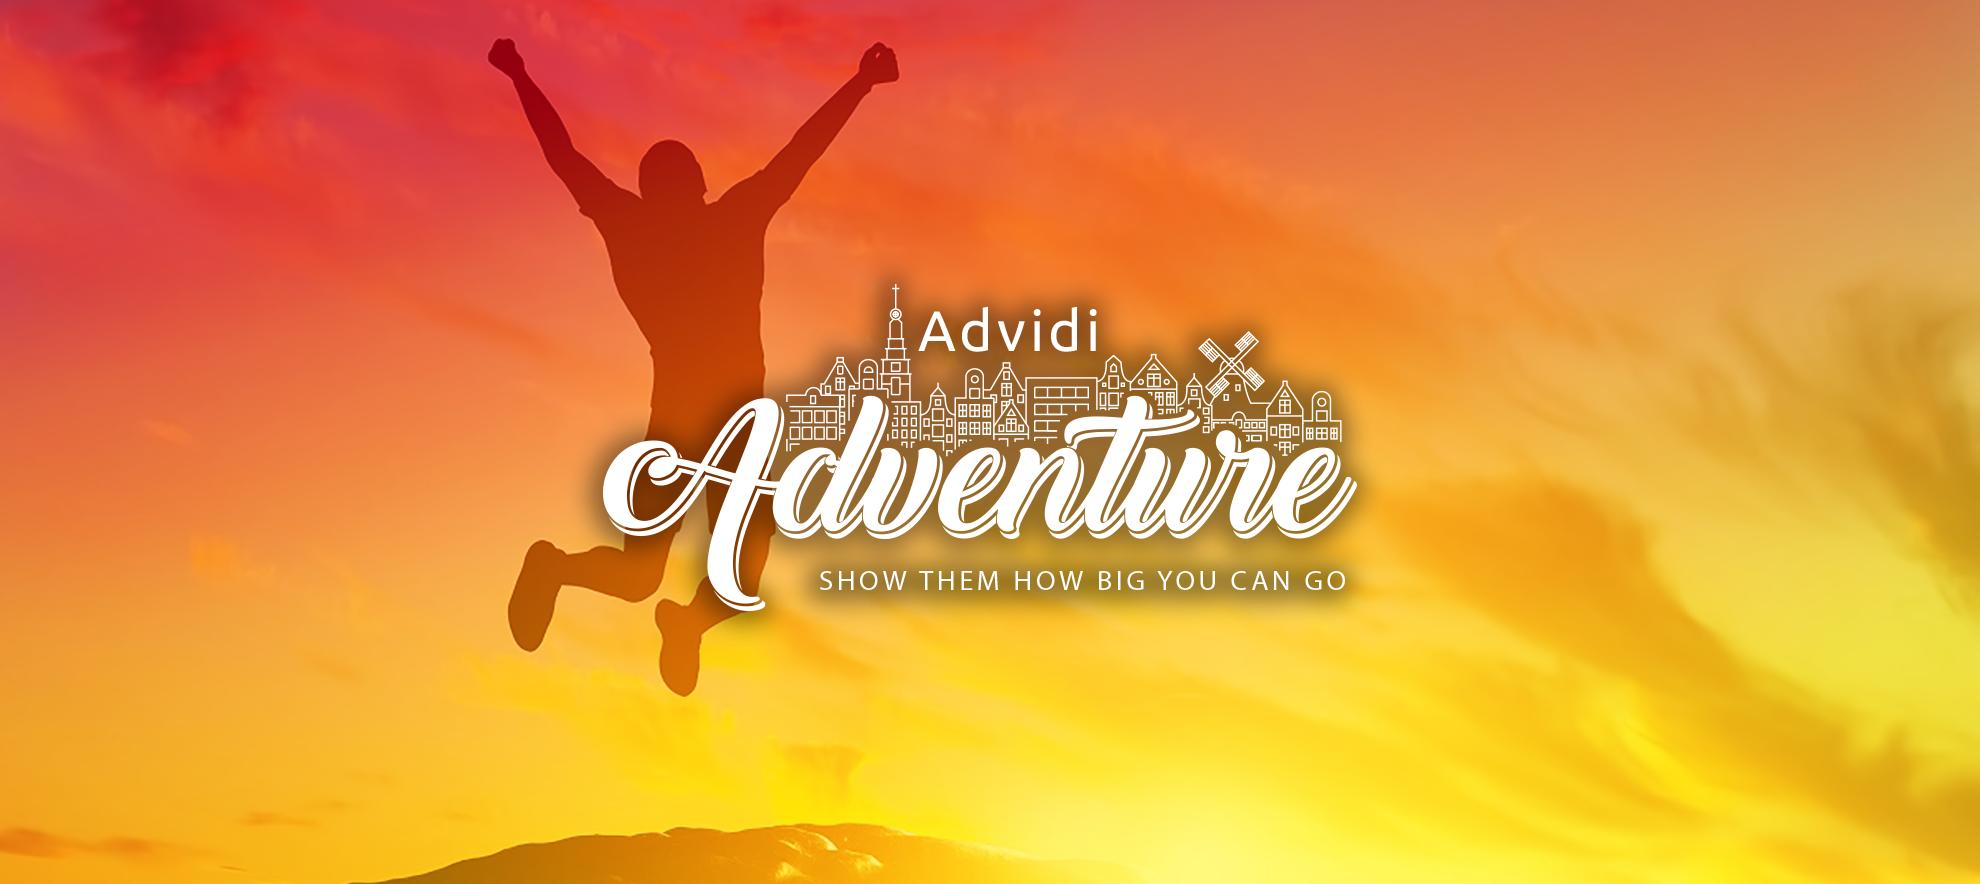 6 Quick Tips to Help You Win Advidi Adventure